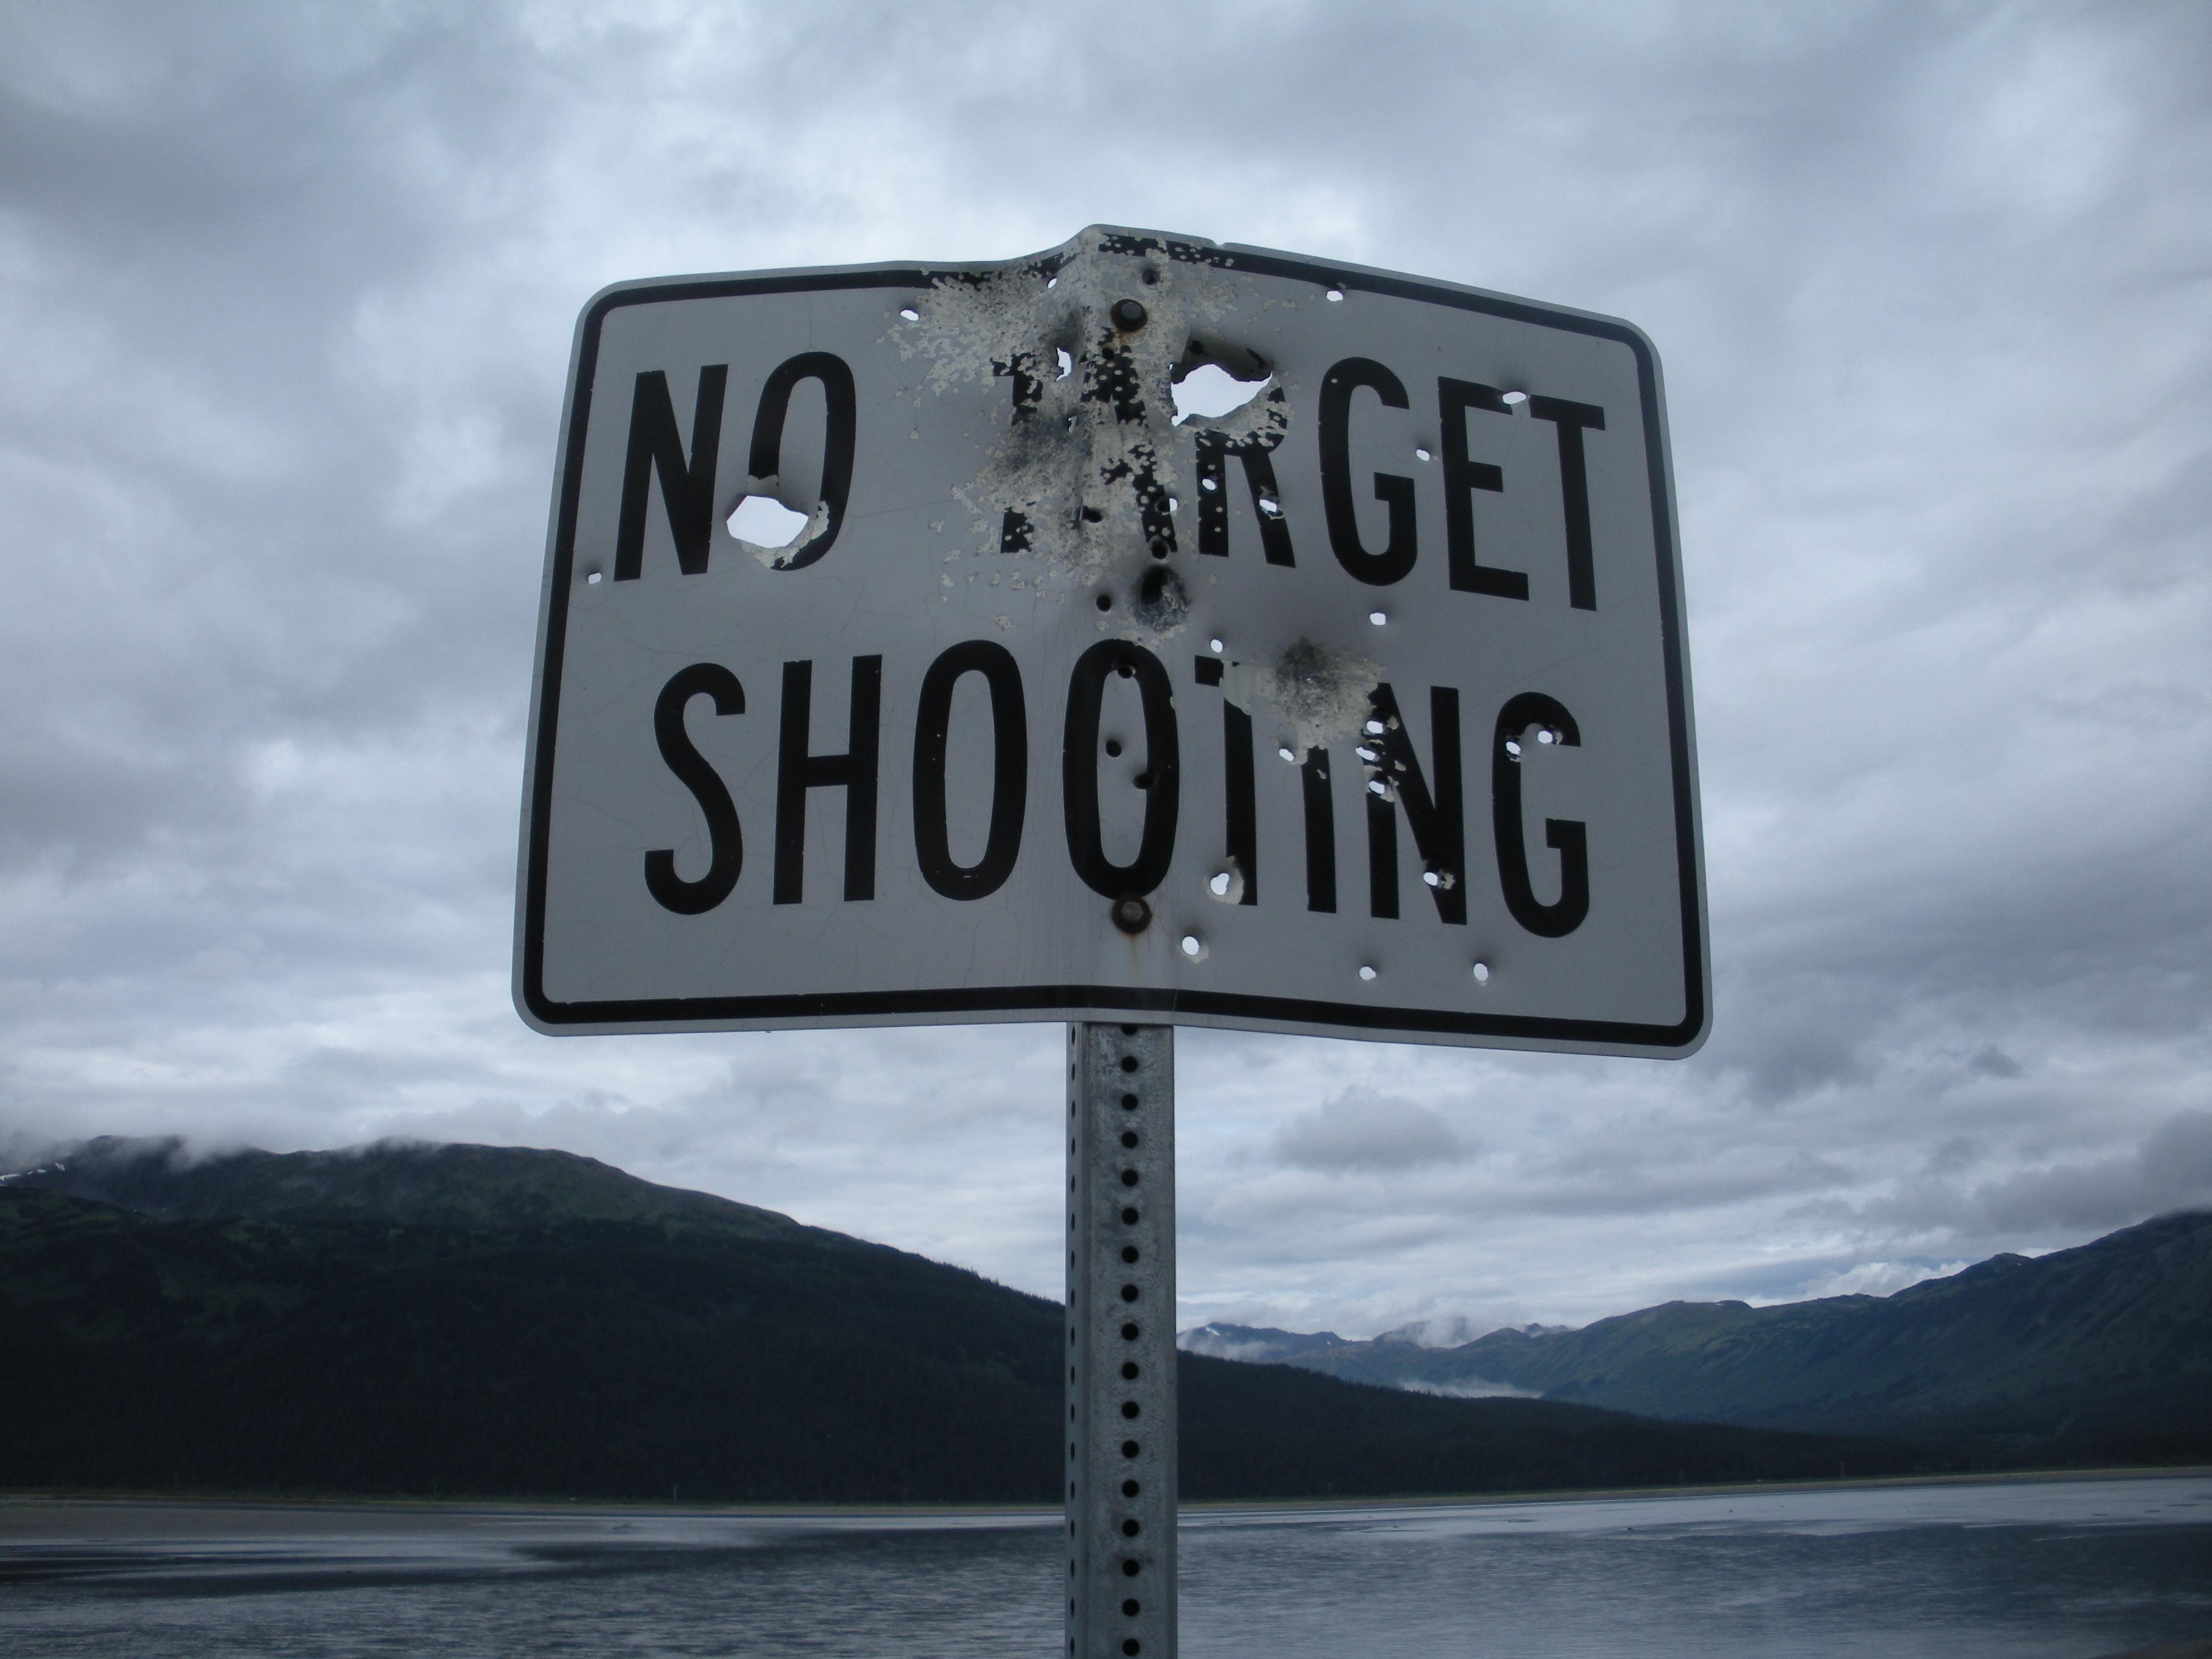 File:No target shooting.jpg - Wikimedia Commons